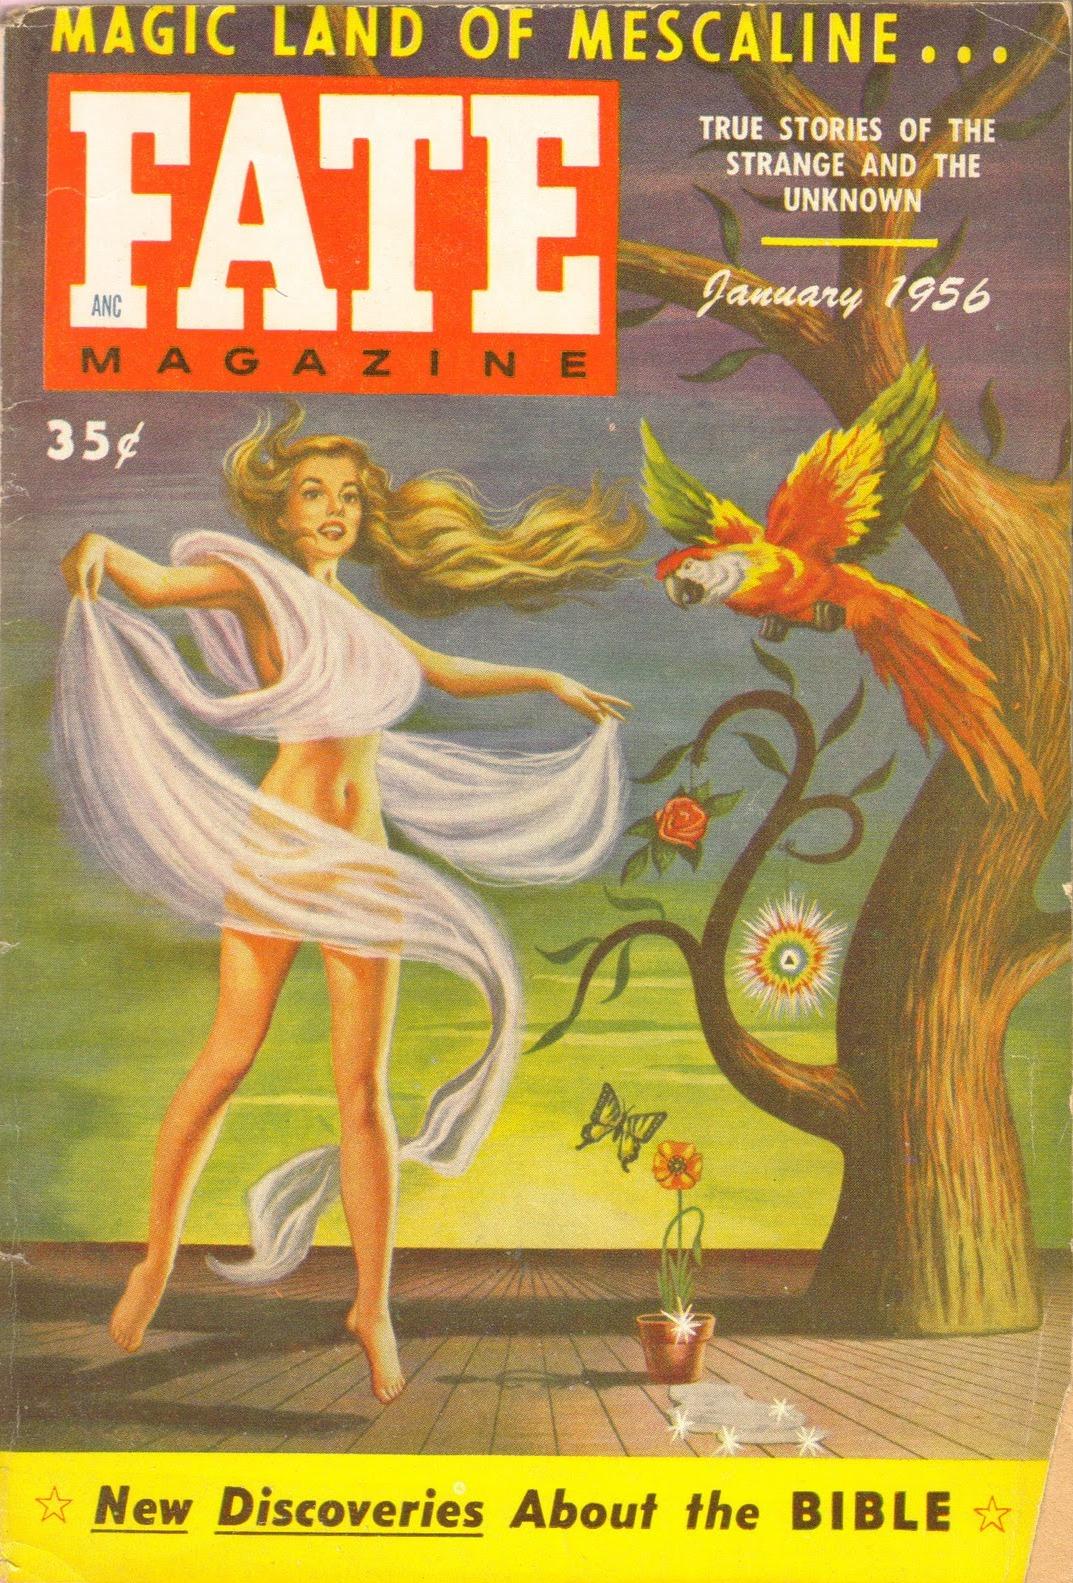 FATE magazine, January 1956